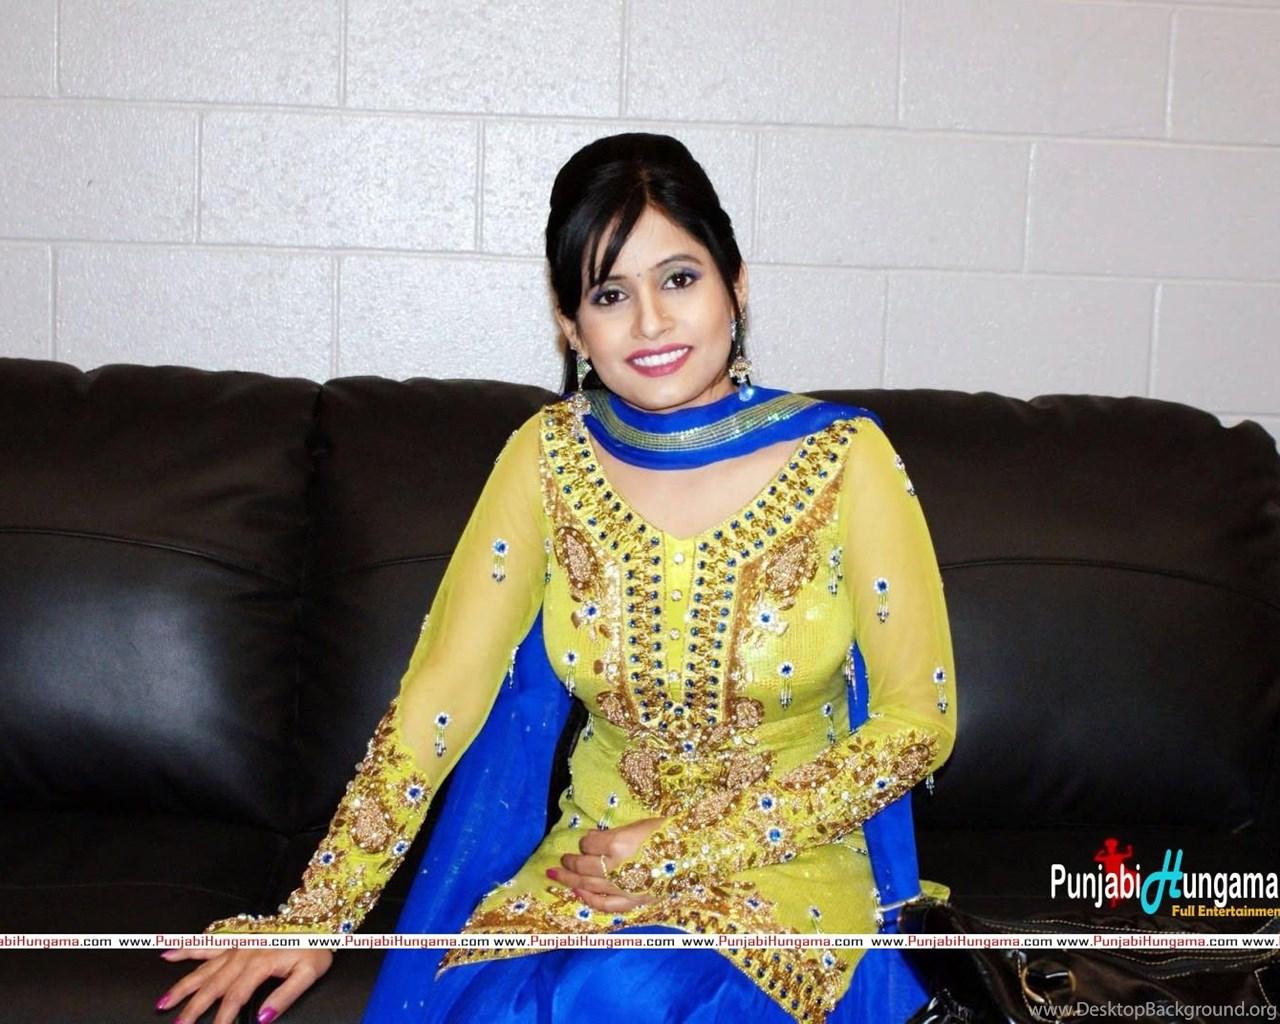 punjabi girl wallpaper photo hd download punjabi girl wallpaper photo hd download